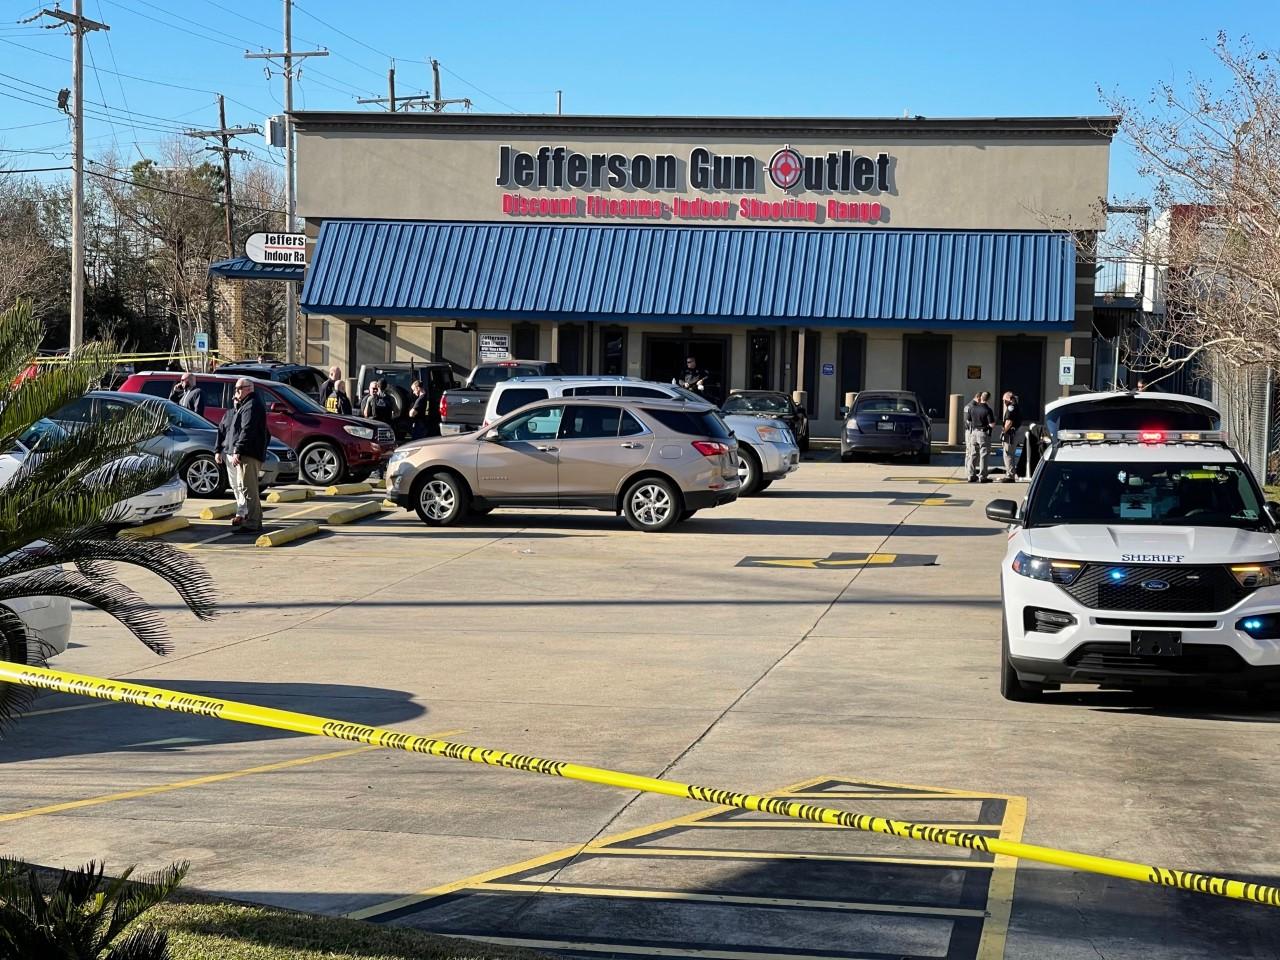 JPSO updates Jefferson gun store shooting that left 3 dead, 2 wounded - WDAF FOX4 Kansas City